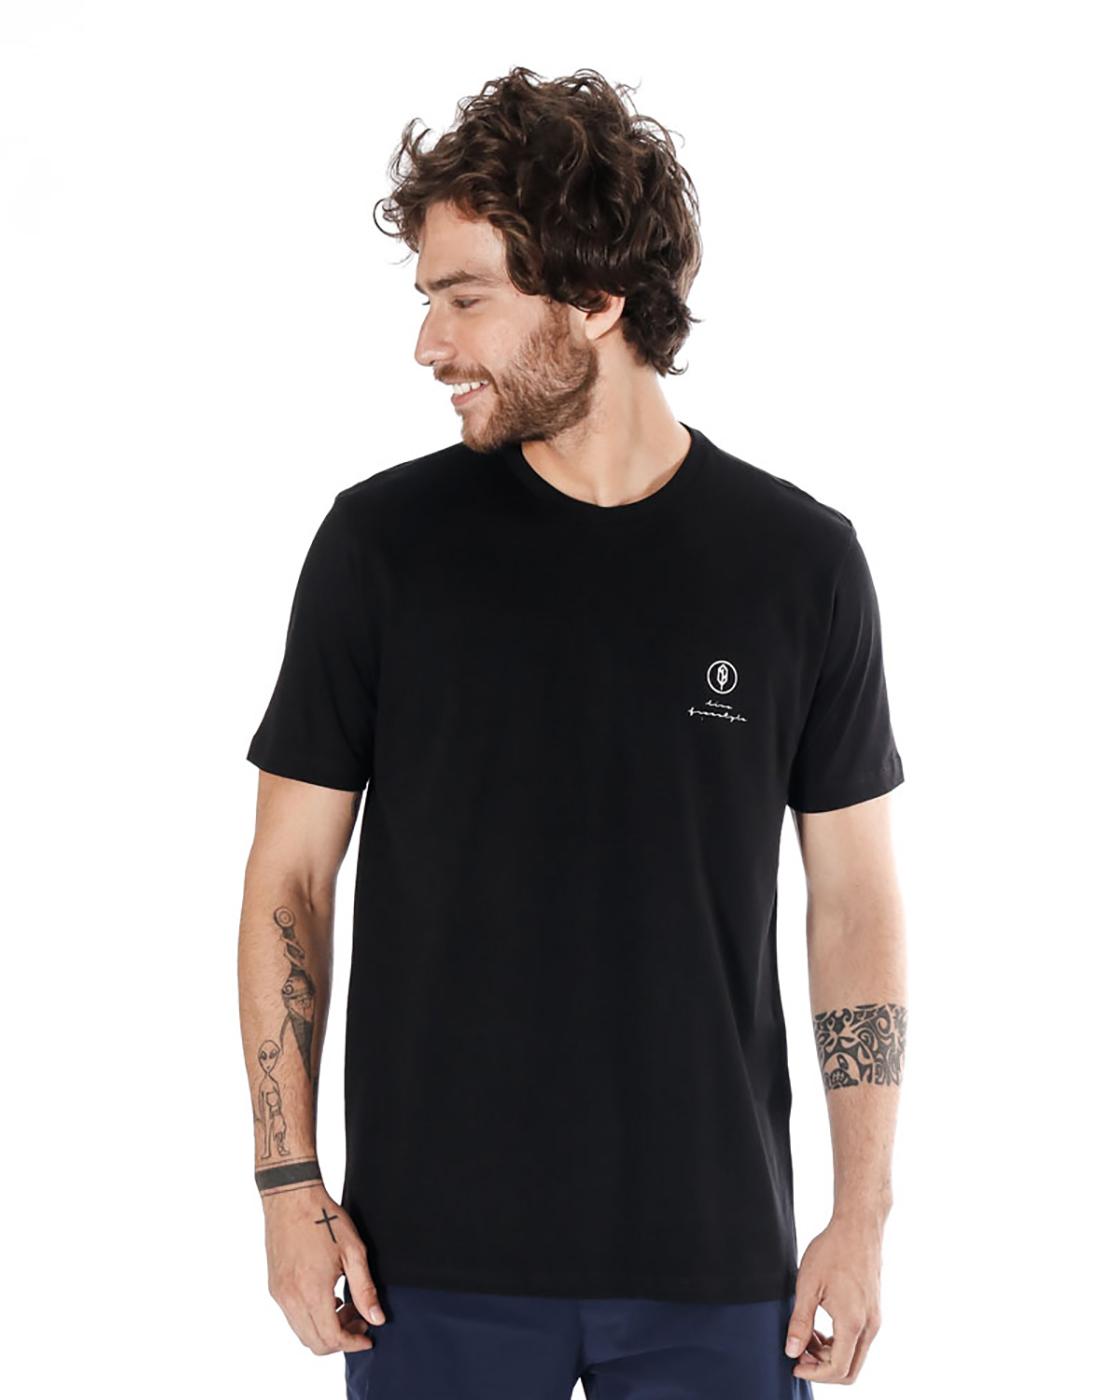 Camiseta Estampada Board Preto Pena